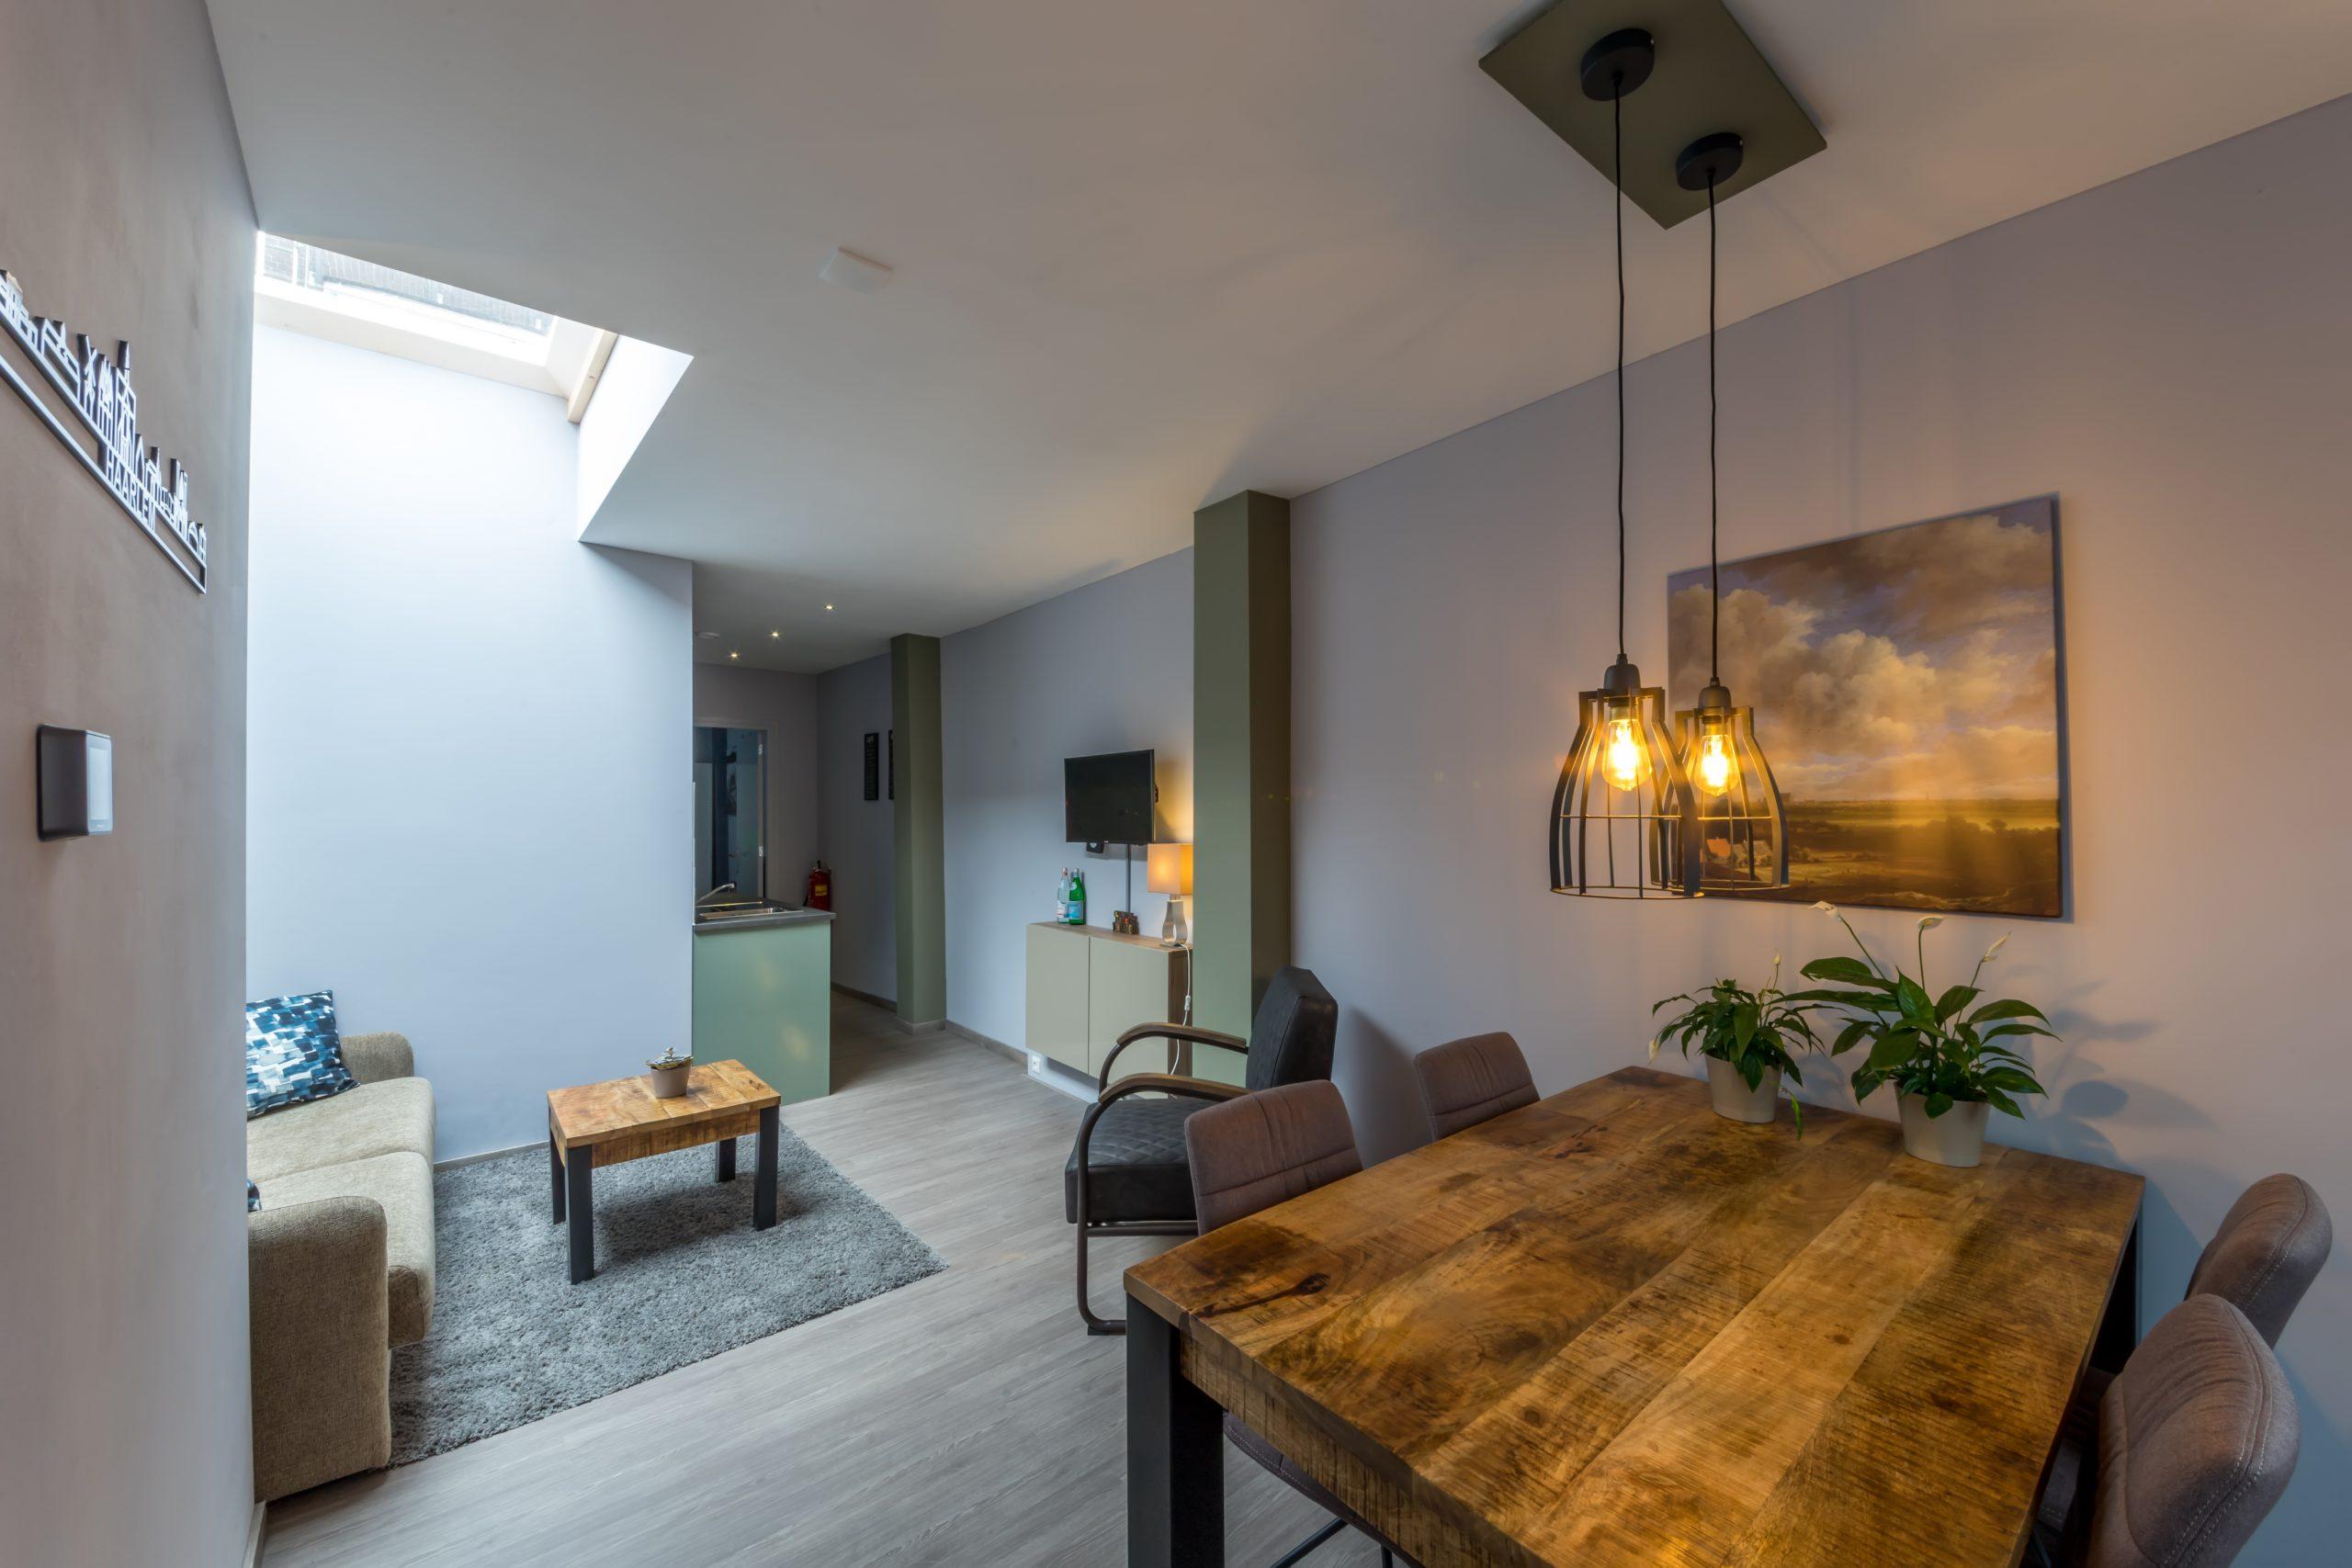 Woonkamer-Livingroom-wohnzimmer-Jacob-van-Ruisdael-Relaxed-Slapen-2